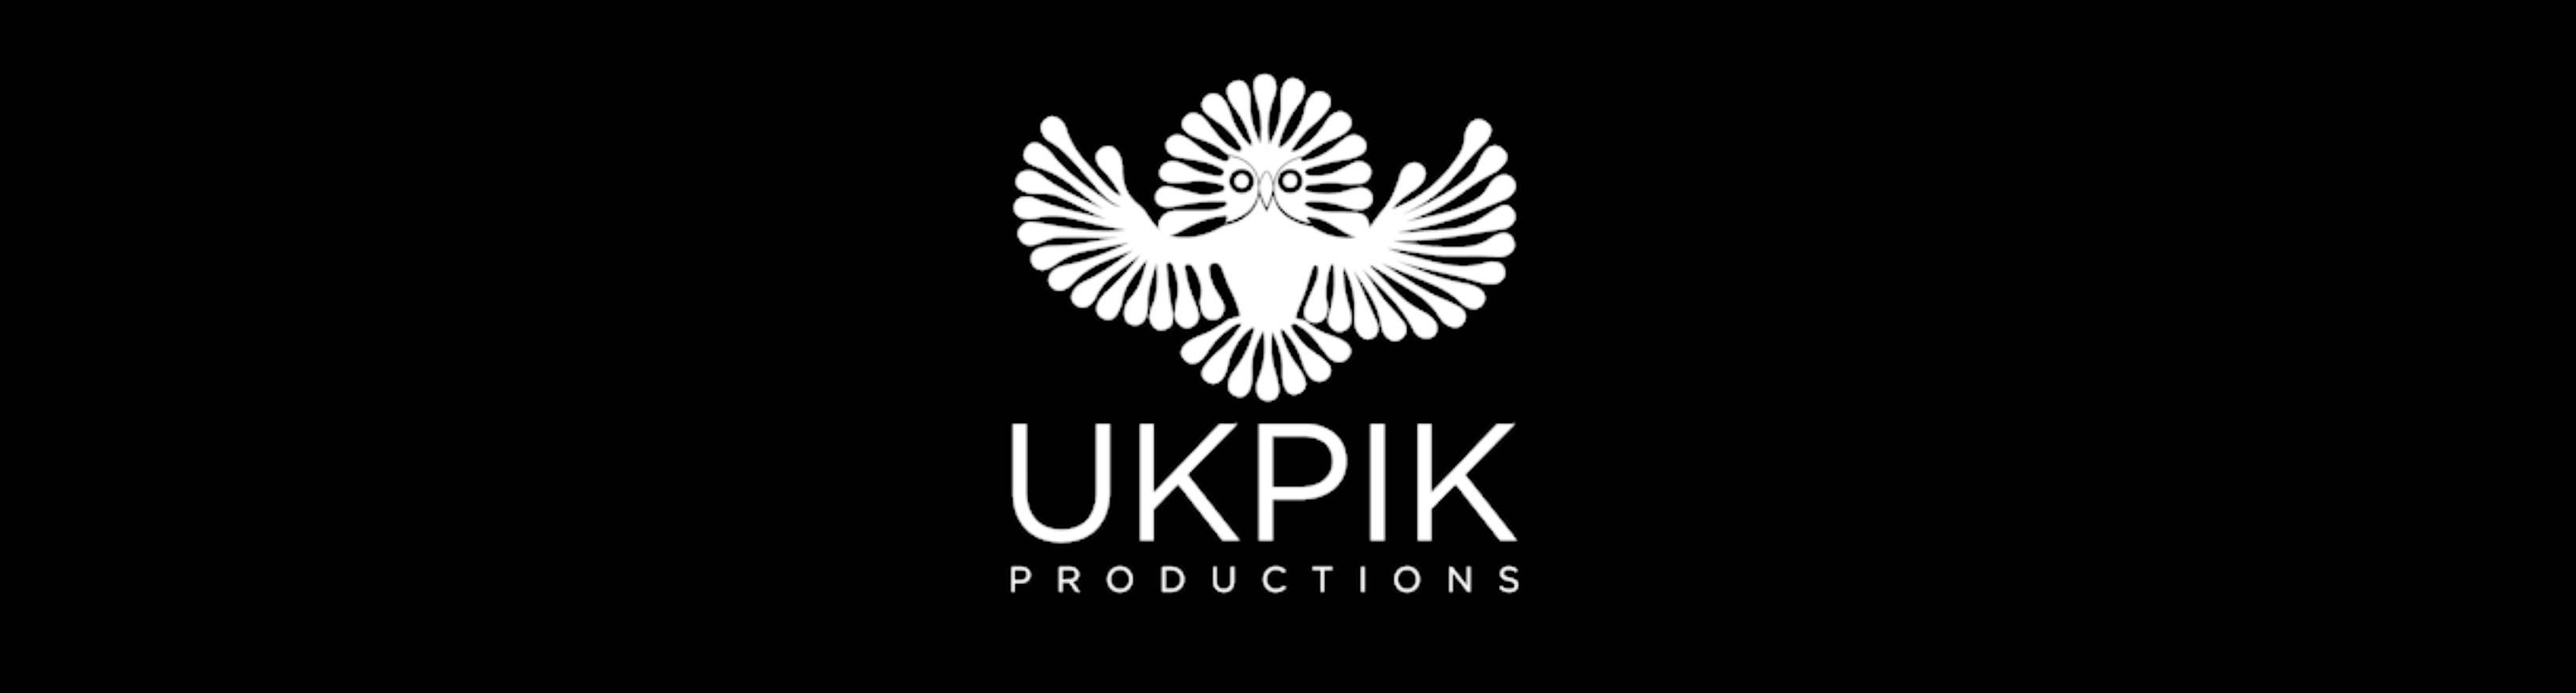 ukpik-productions-audiovisual-postproducción-logo-productora-audiovisual-valencia